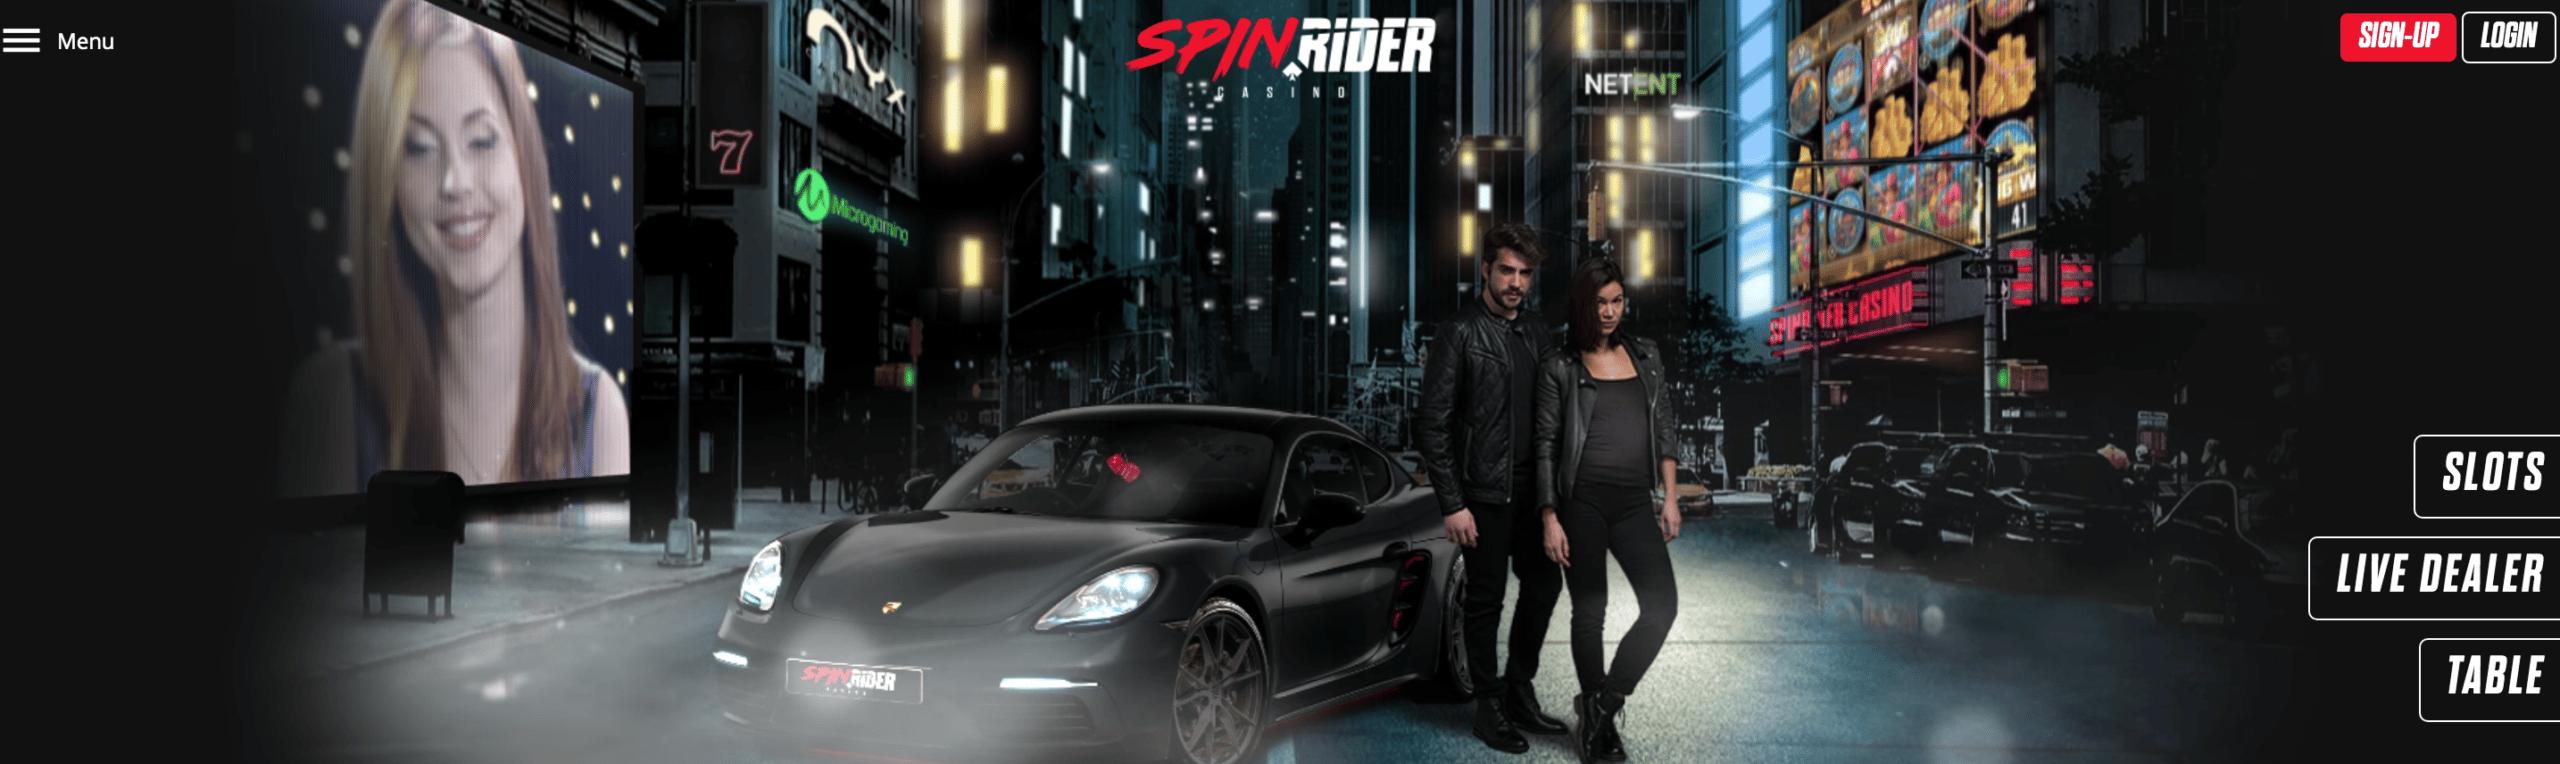 spin rider screen shot